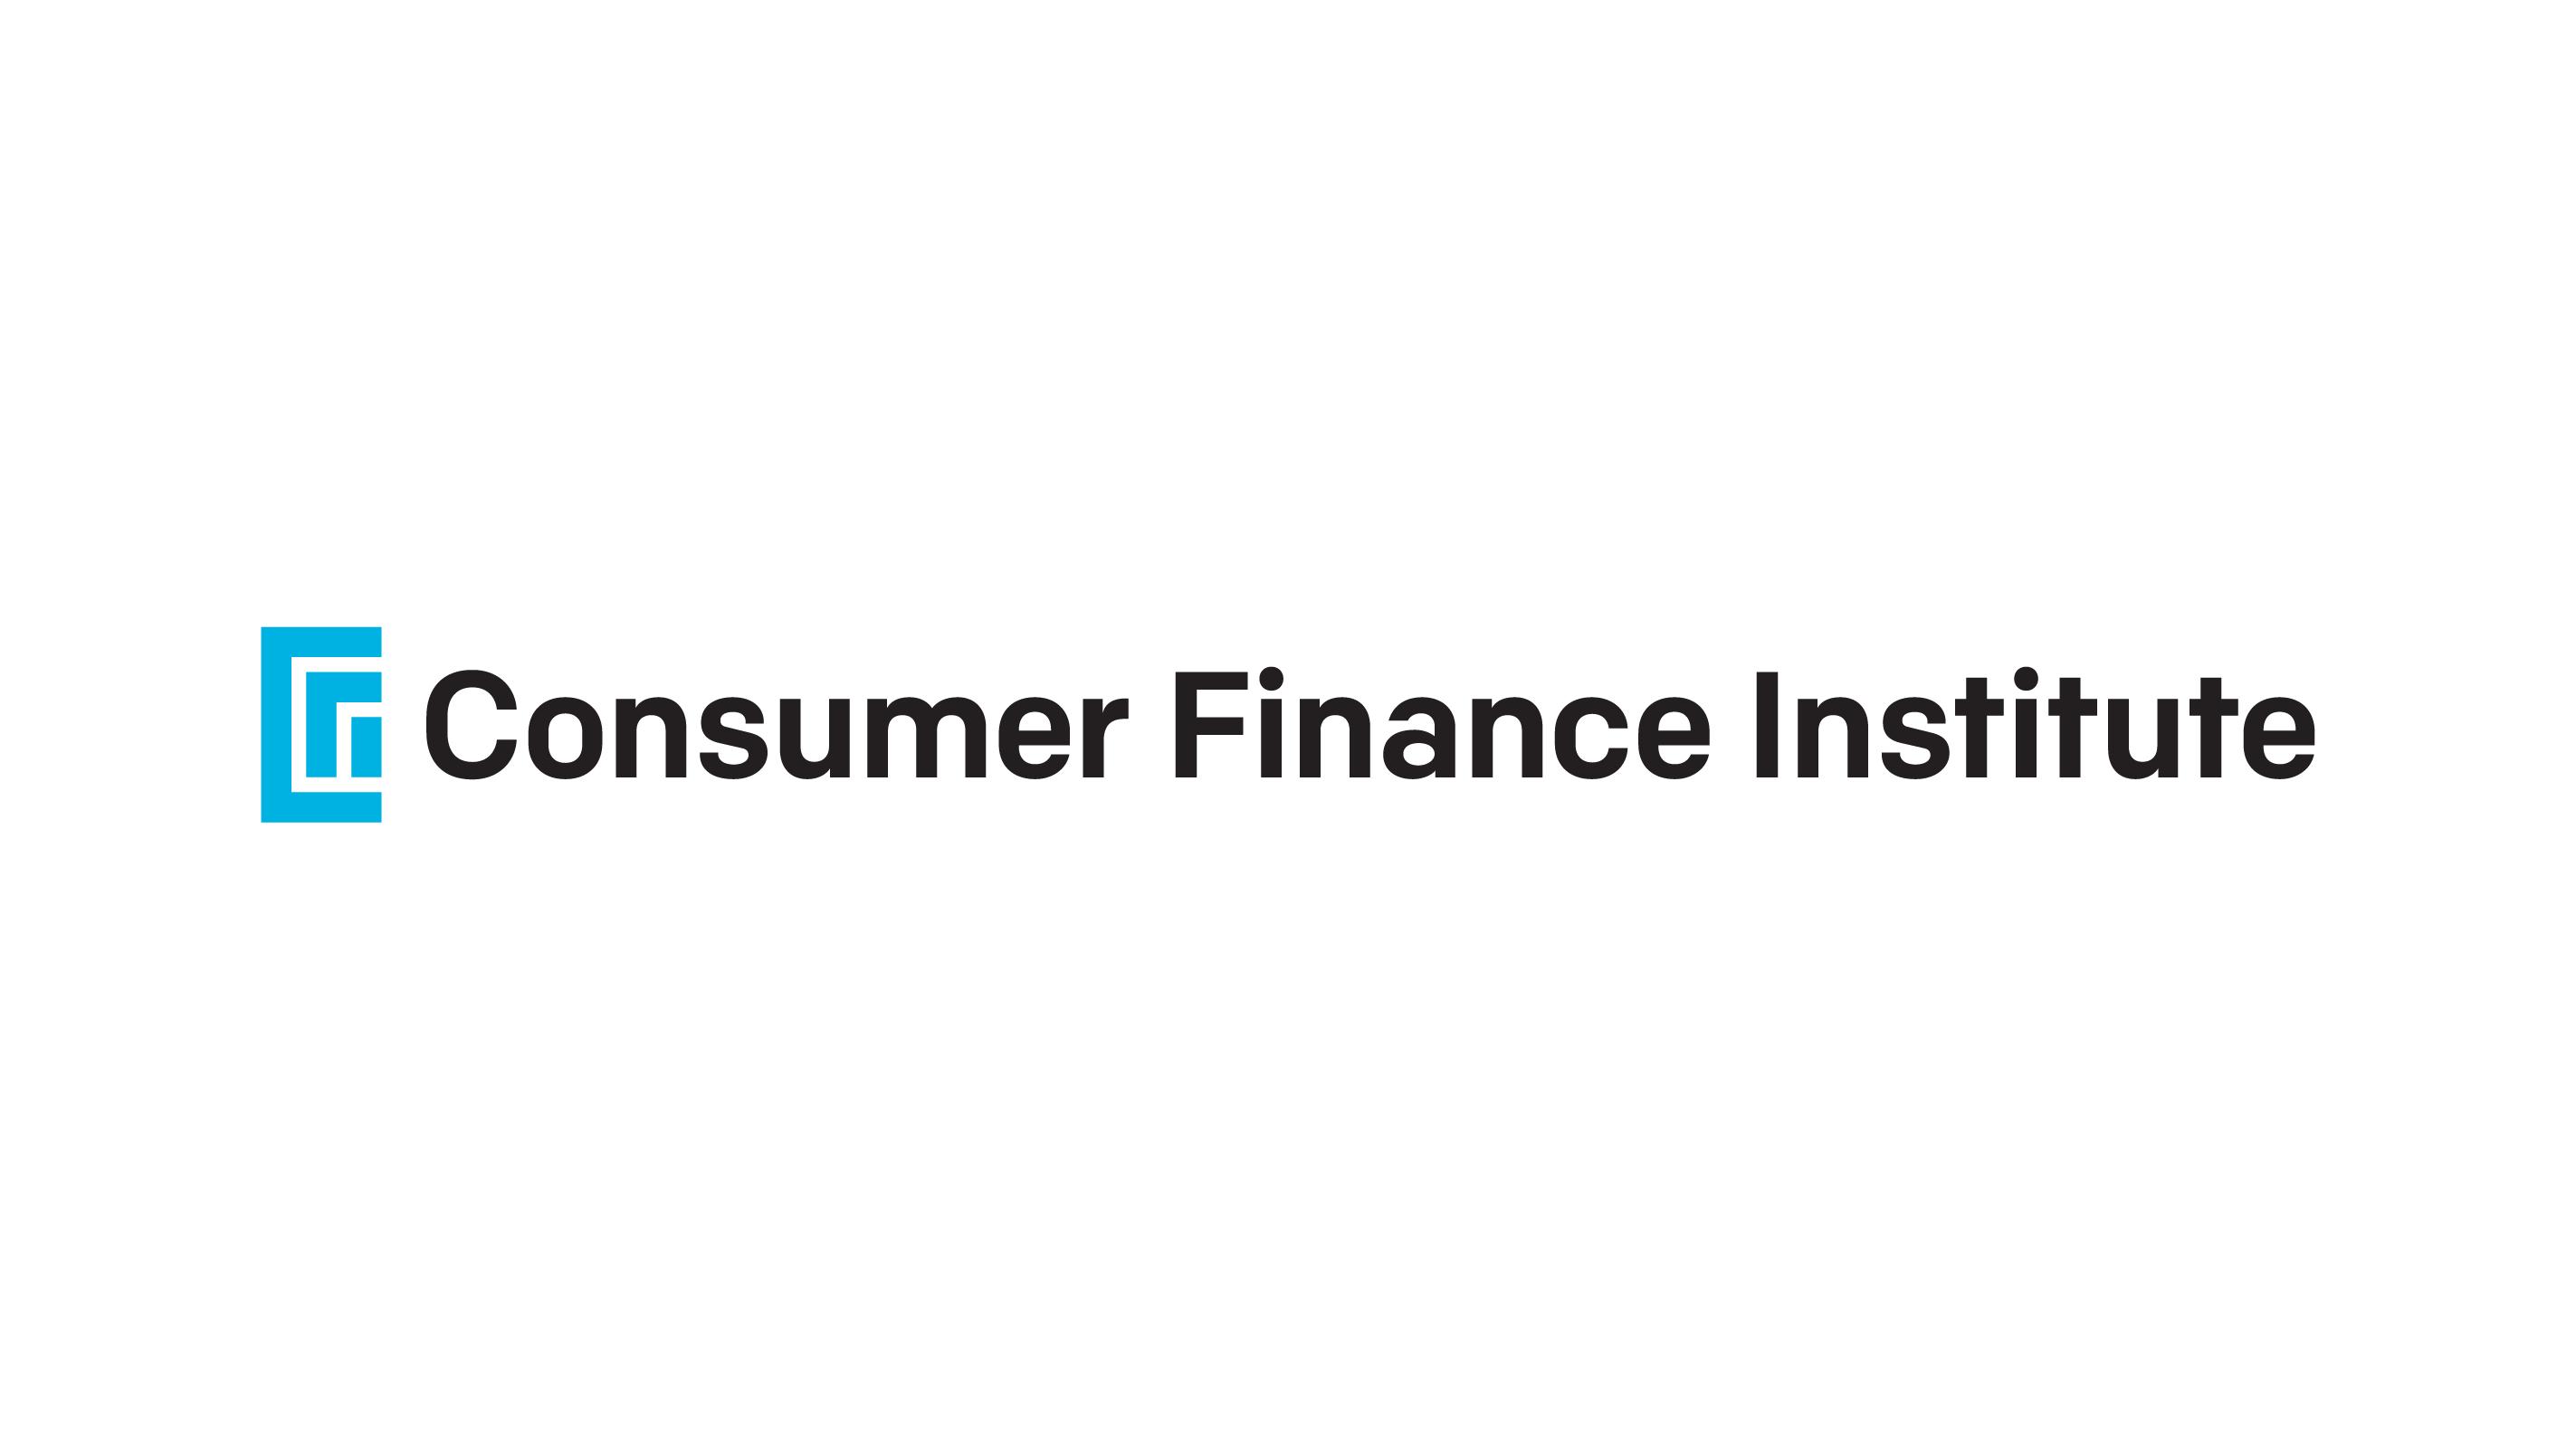 Consumer Finance Institute Brand